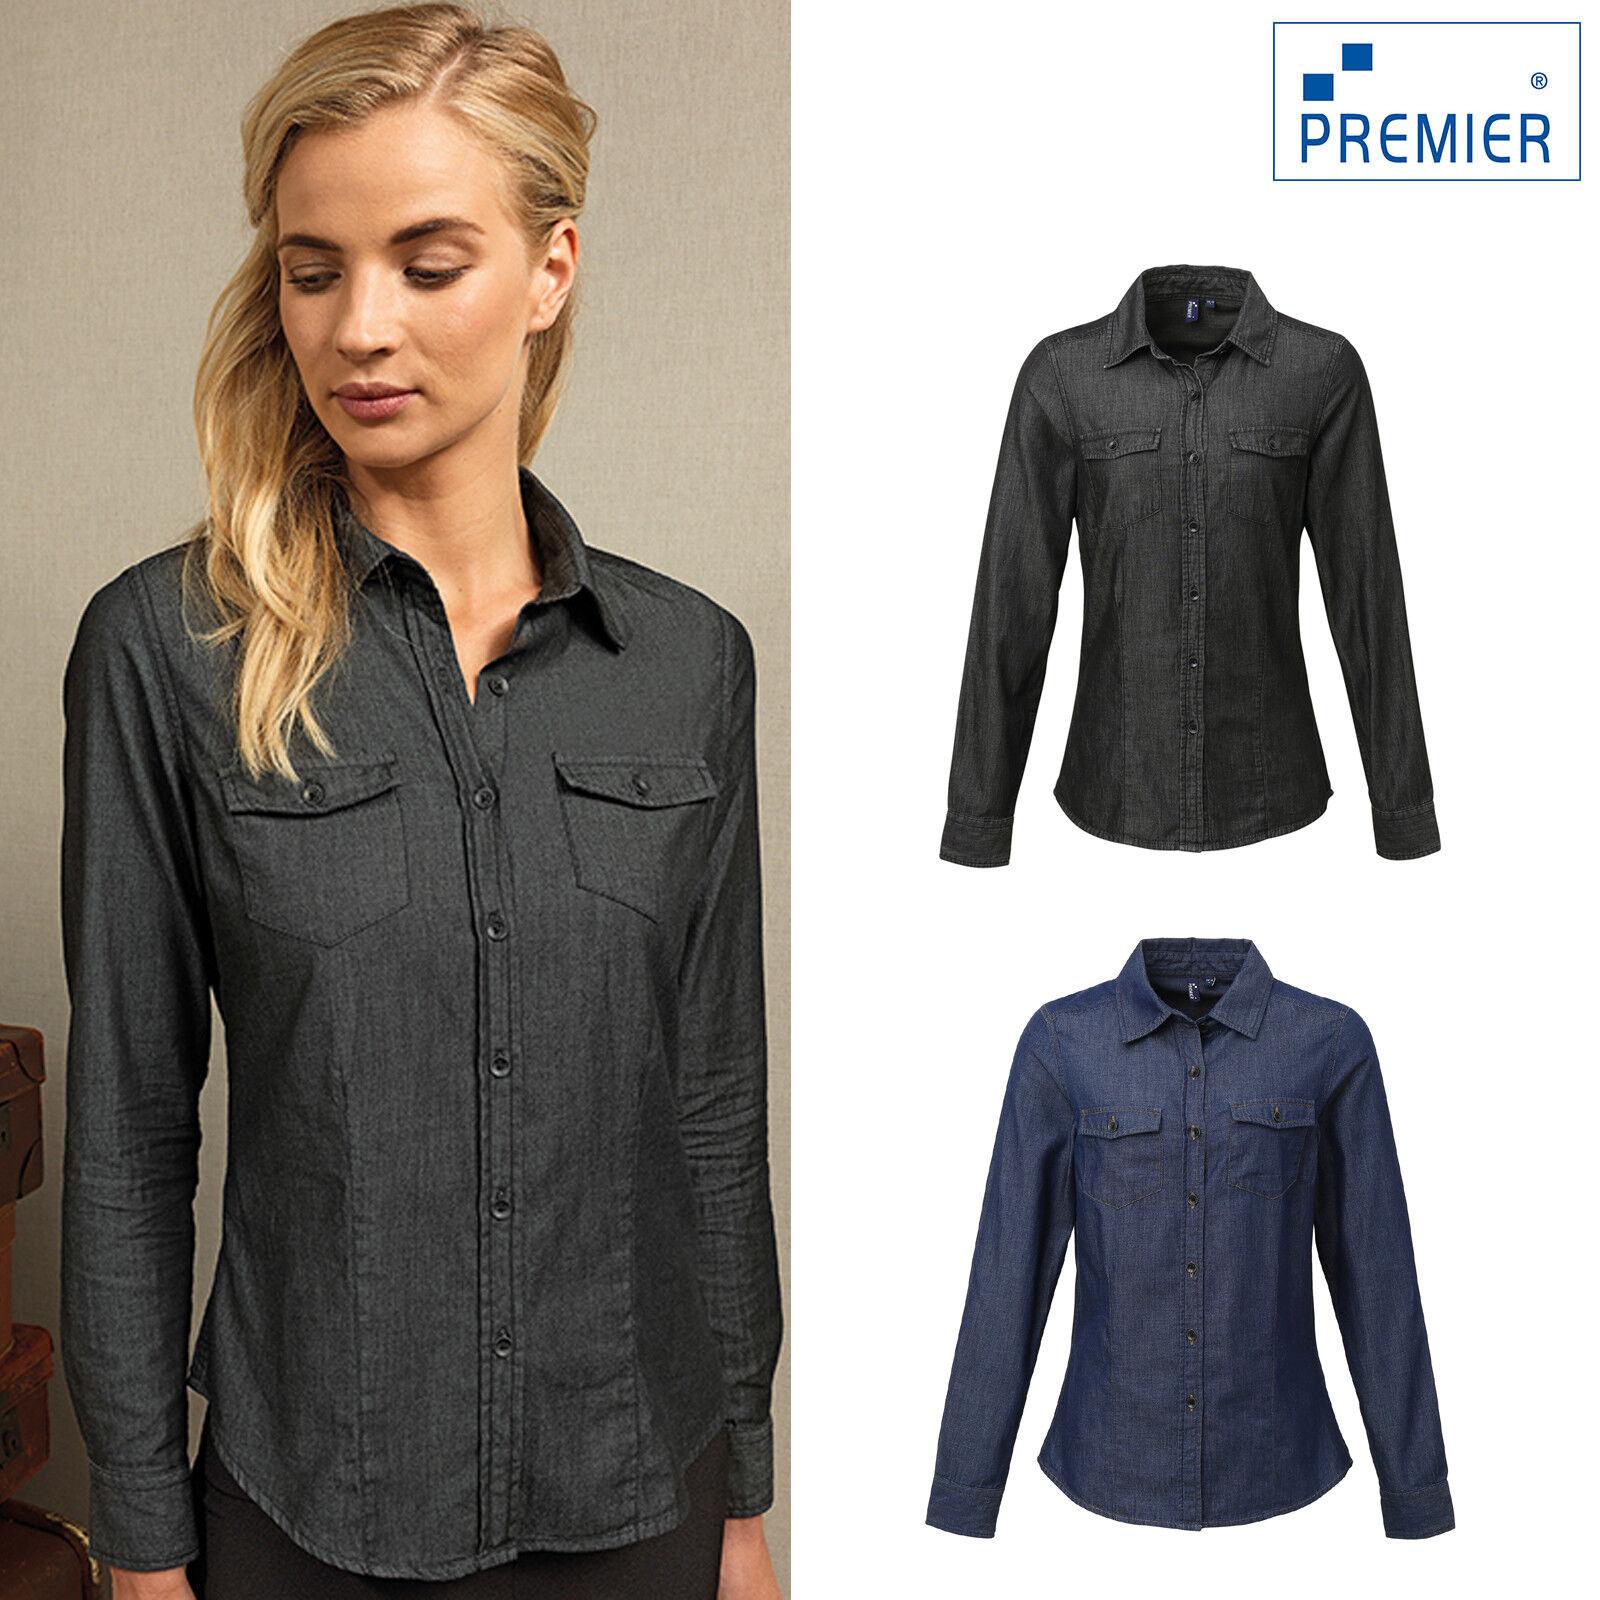 Premier Women's Jeans Stitch Denim Shirt PR322